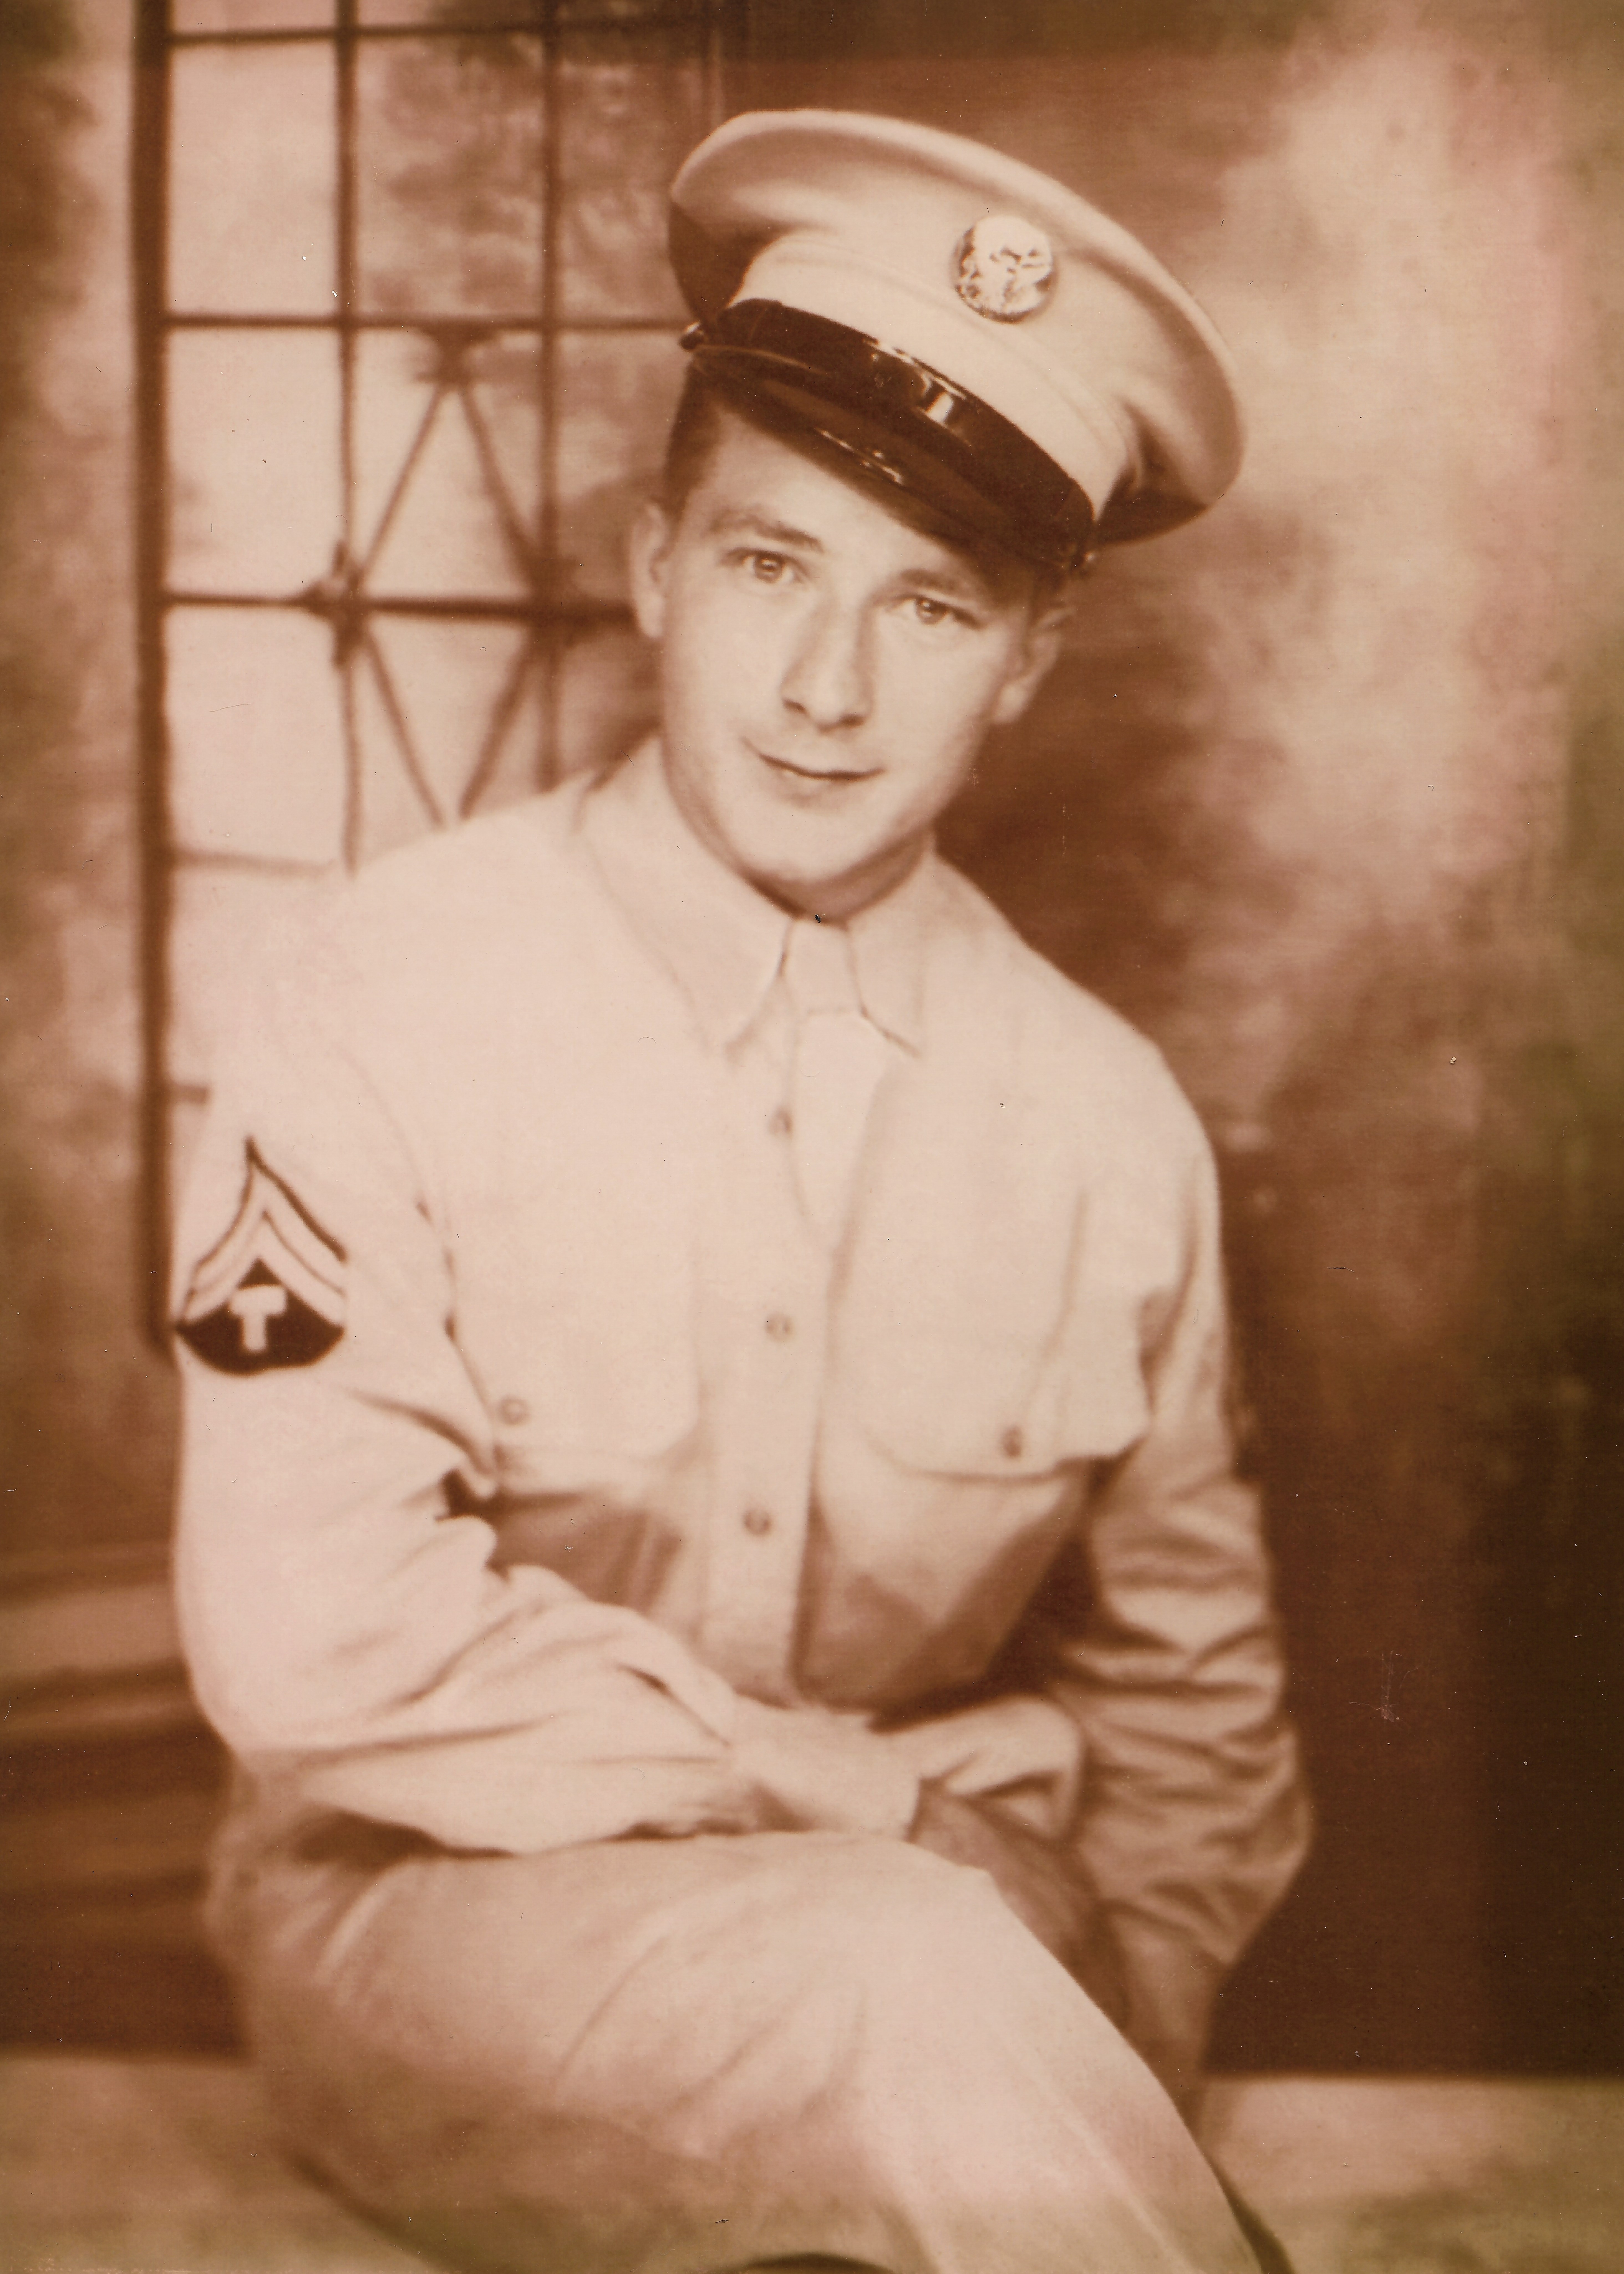 Joseph P. Wojcik